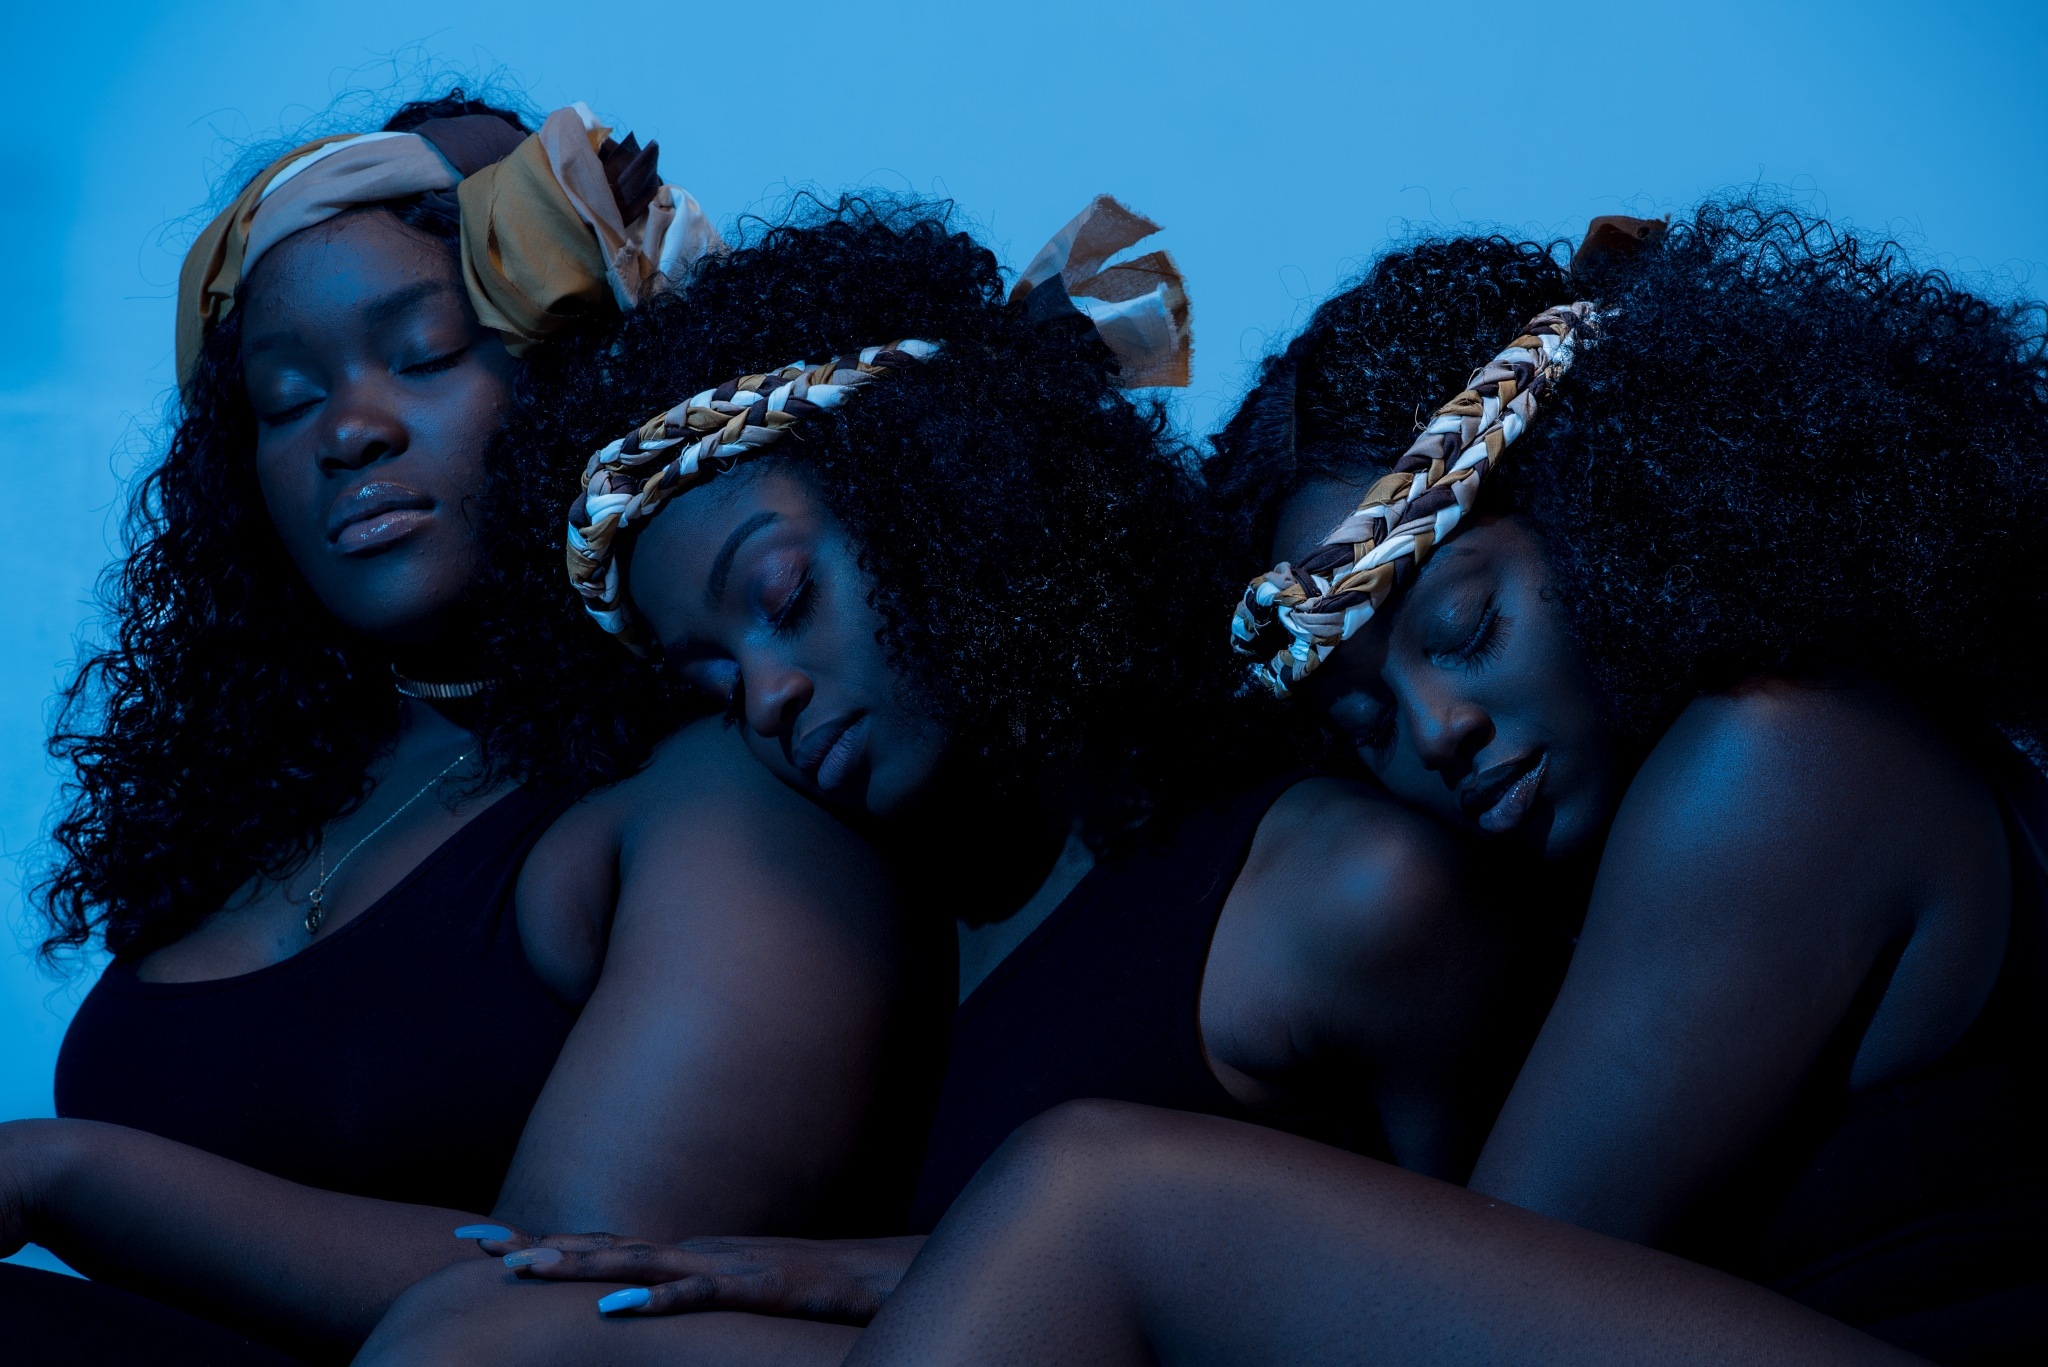 Ladies Of Ebony by CapturedByElijah